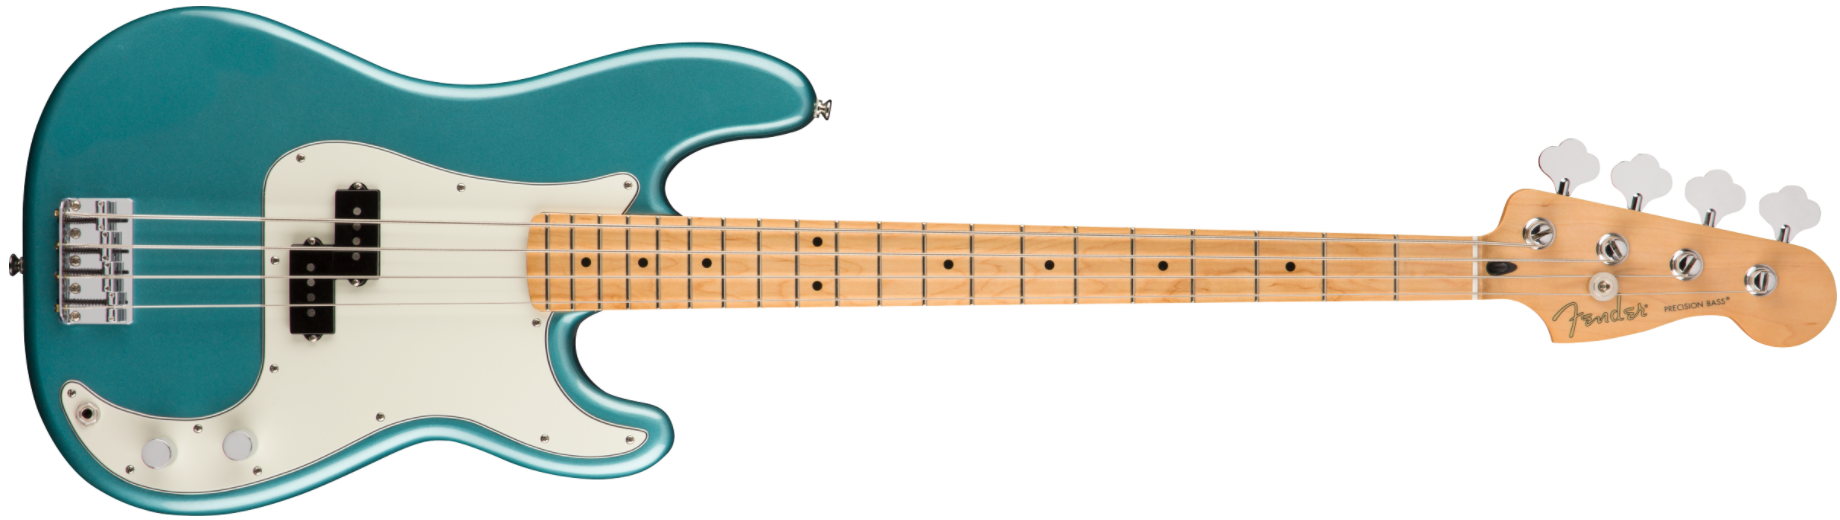 Fender Player P-Bass, MN, Tidepool